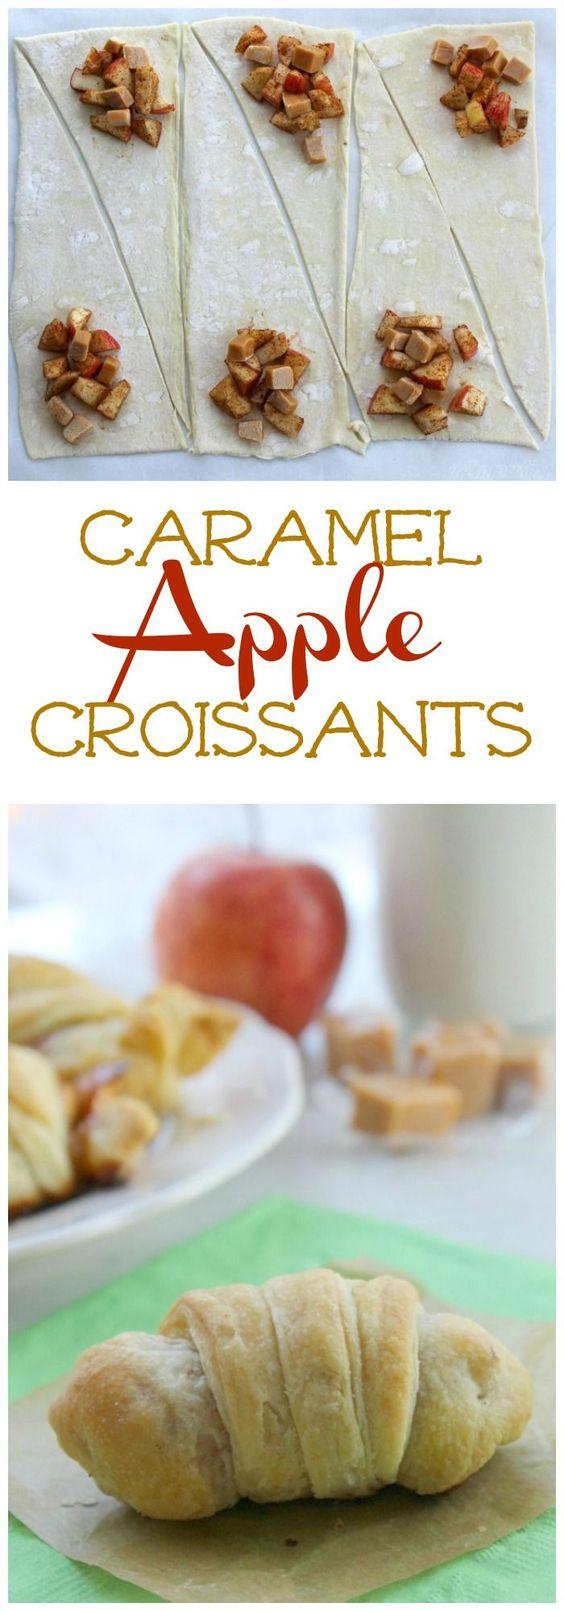 Caramel Apple Croissants   The Bitter Side of Sweet